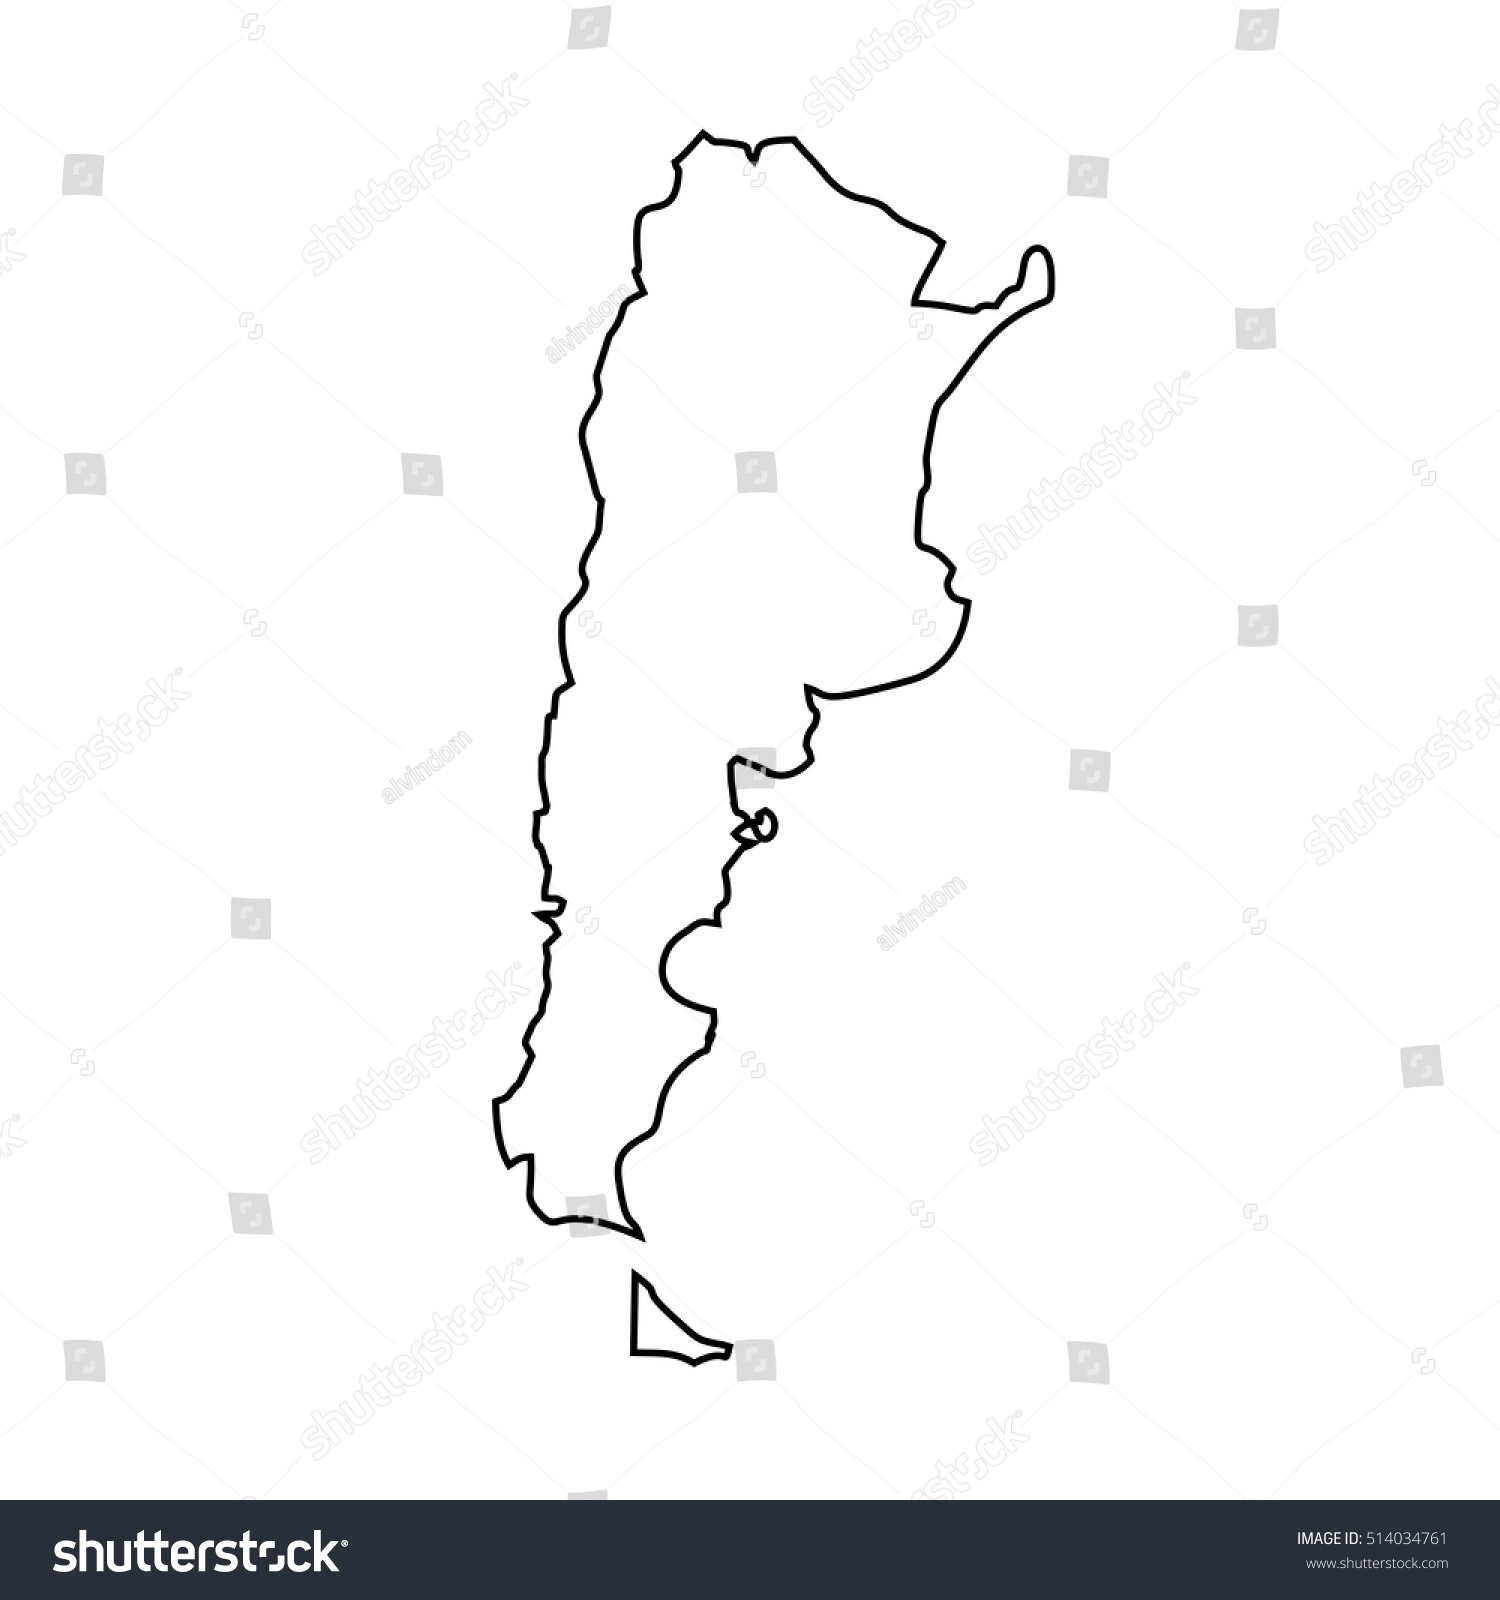 Map Black Outline Argentina Stock Vector Shutterstock - Argentina map outline